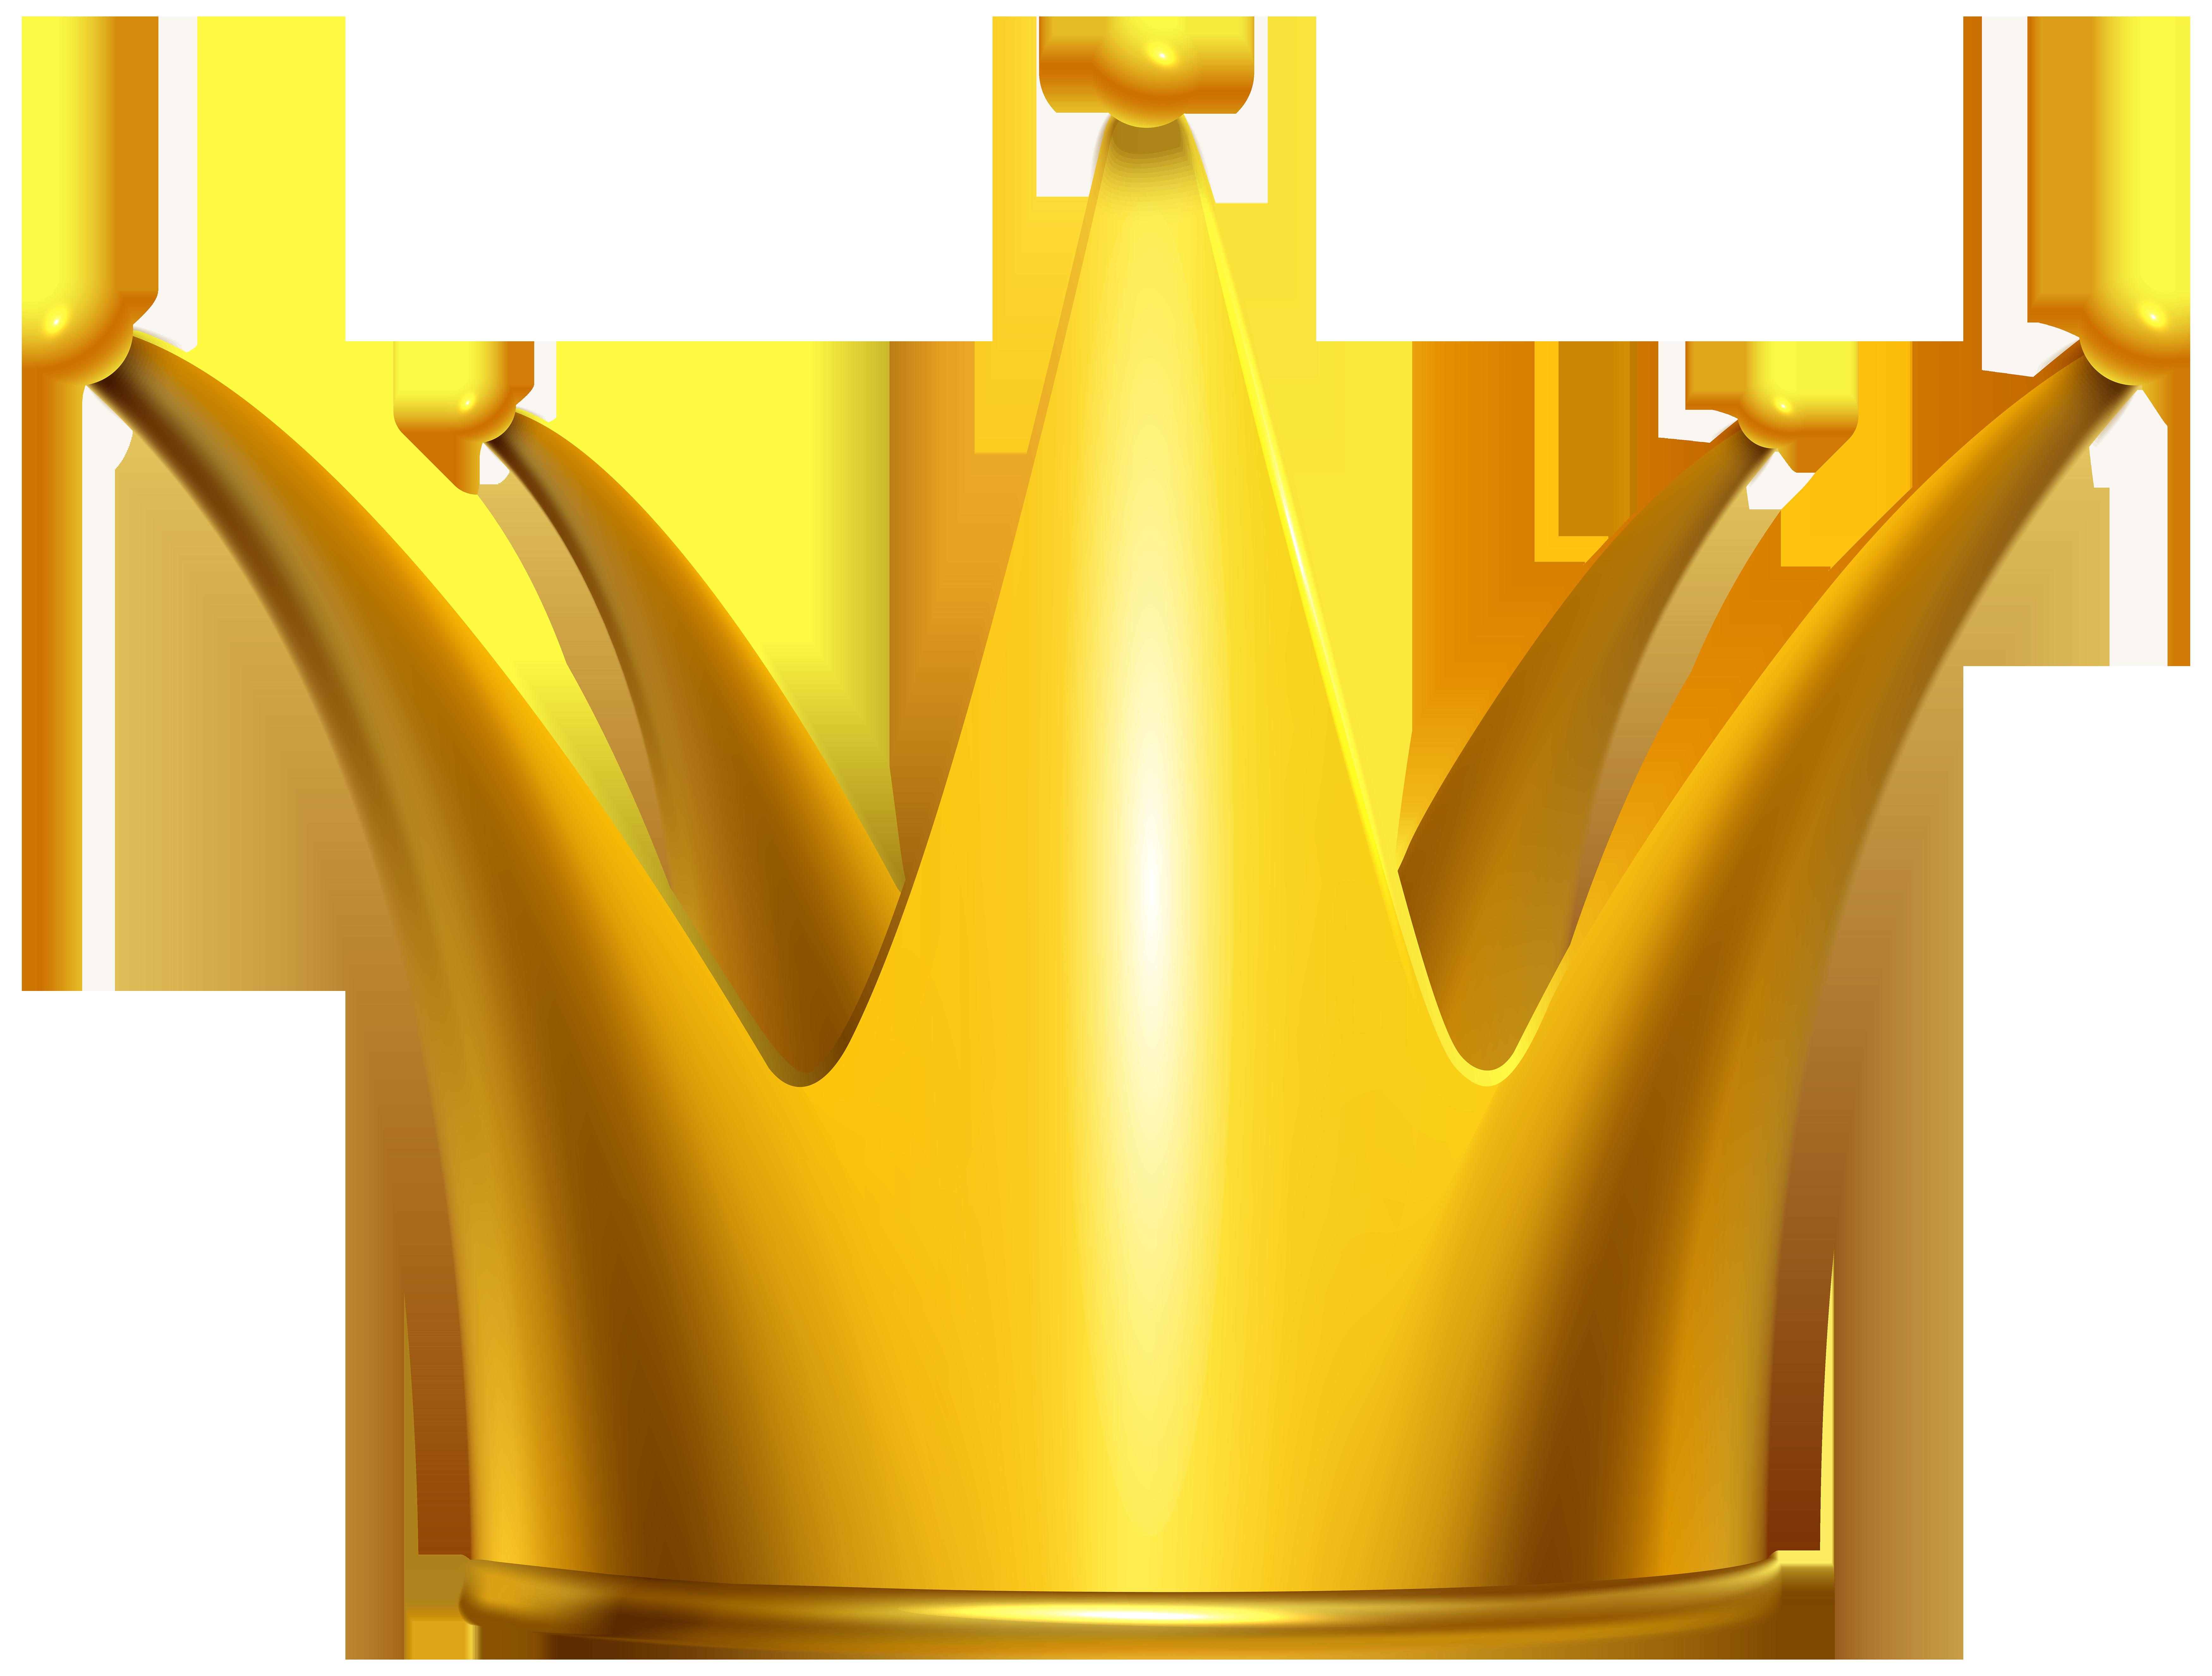 Golden Crown Clip Art PNG Image.